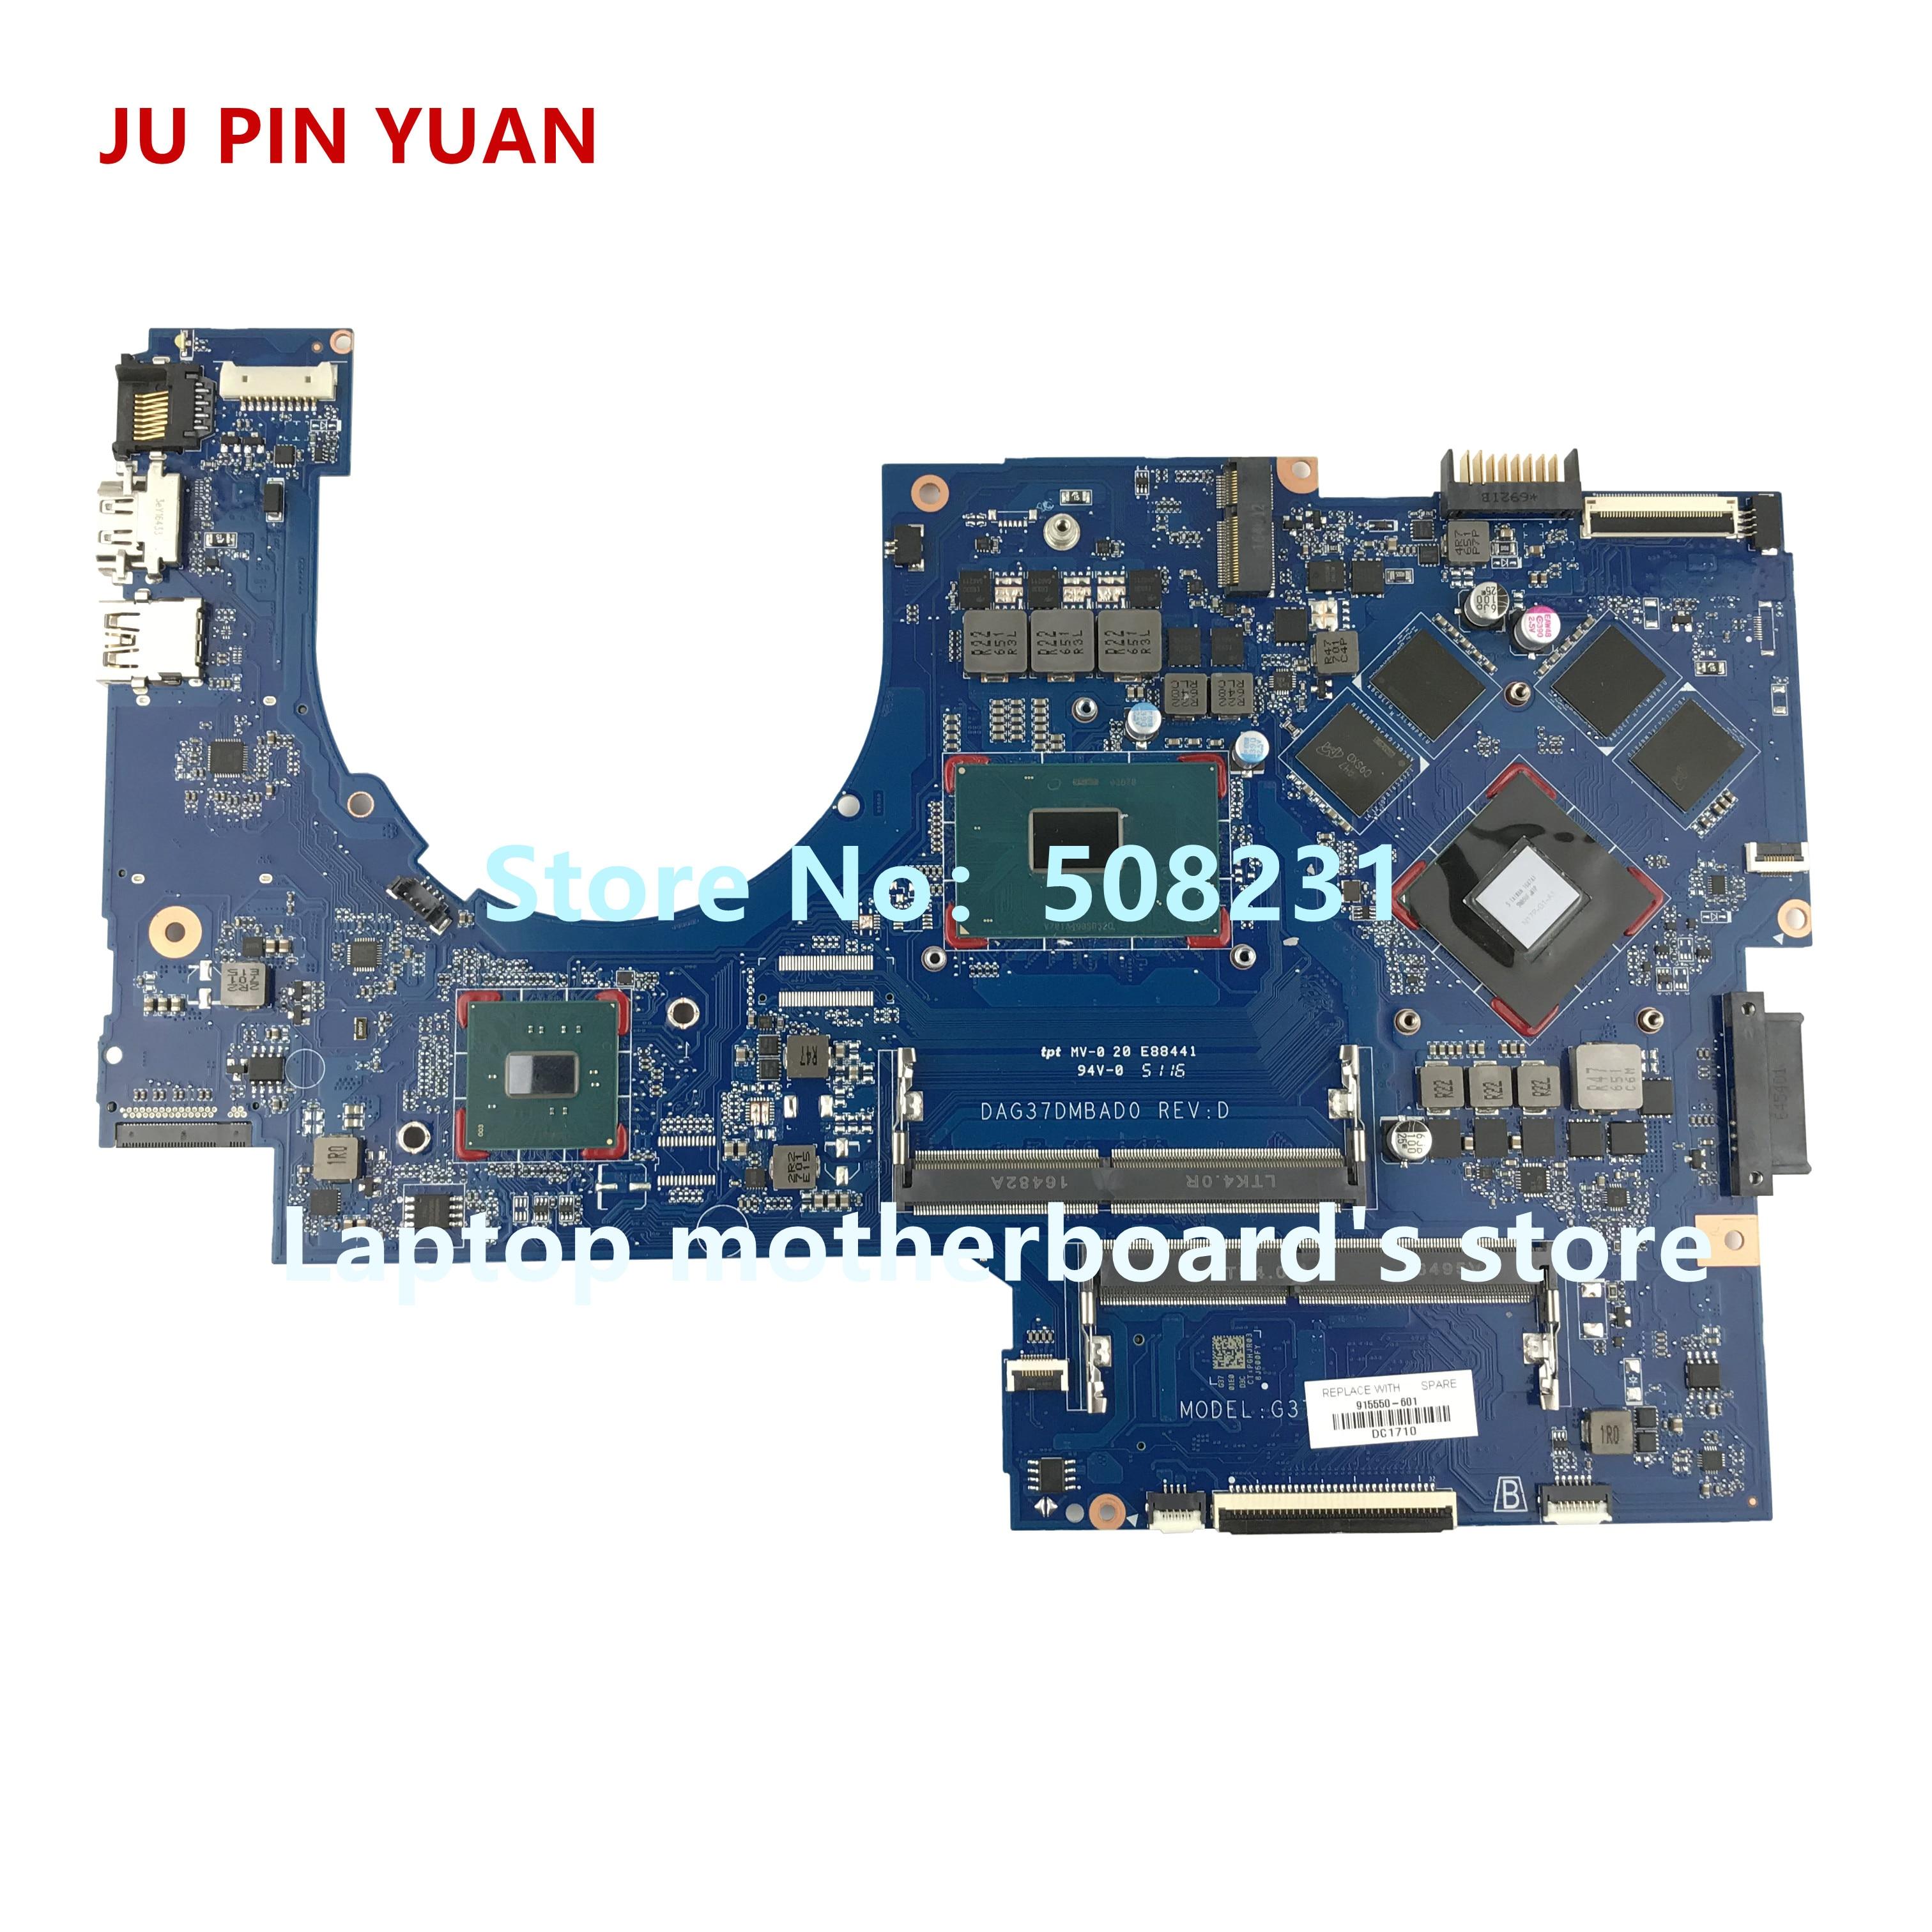 JU PIN YUAN 915550-601 G37D 17-W 17T-W DAG37DMBAD0 915550-501 para HP NOTEBOOK laptop motherboard com 1050Ti 4 gb i7-7700HQ